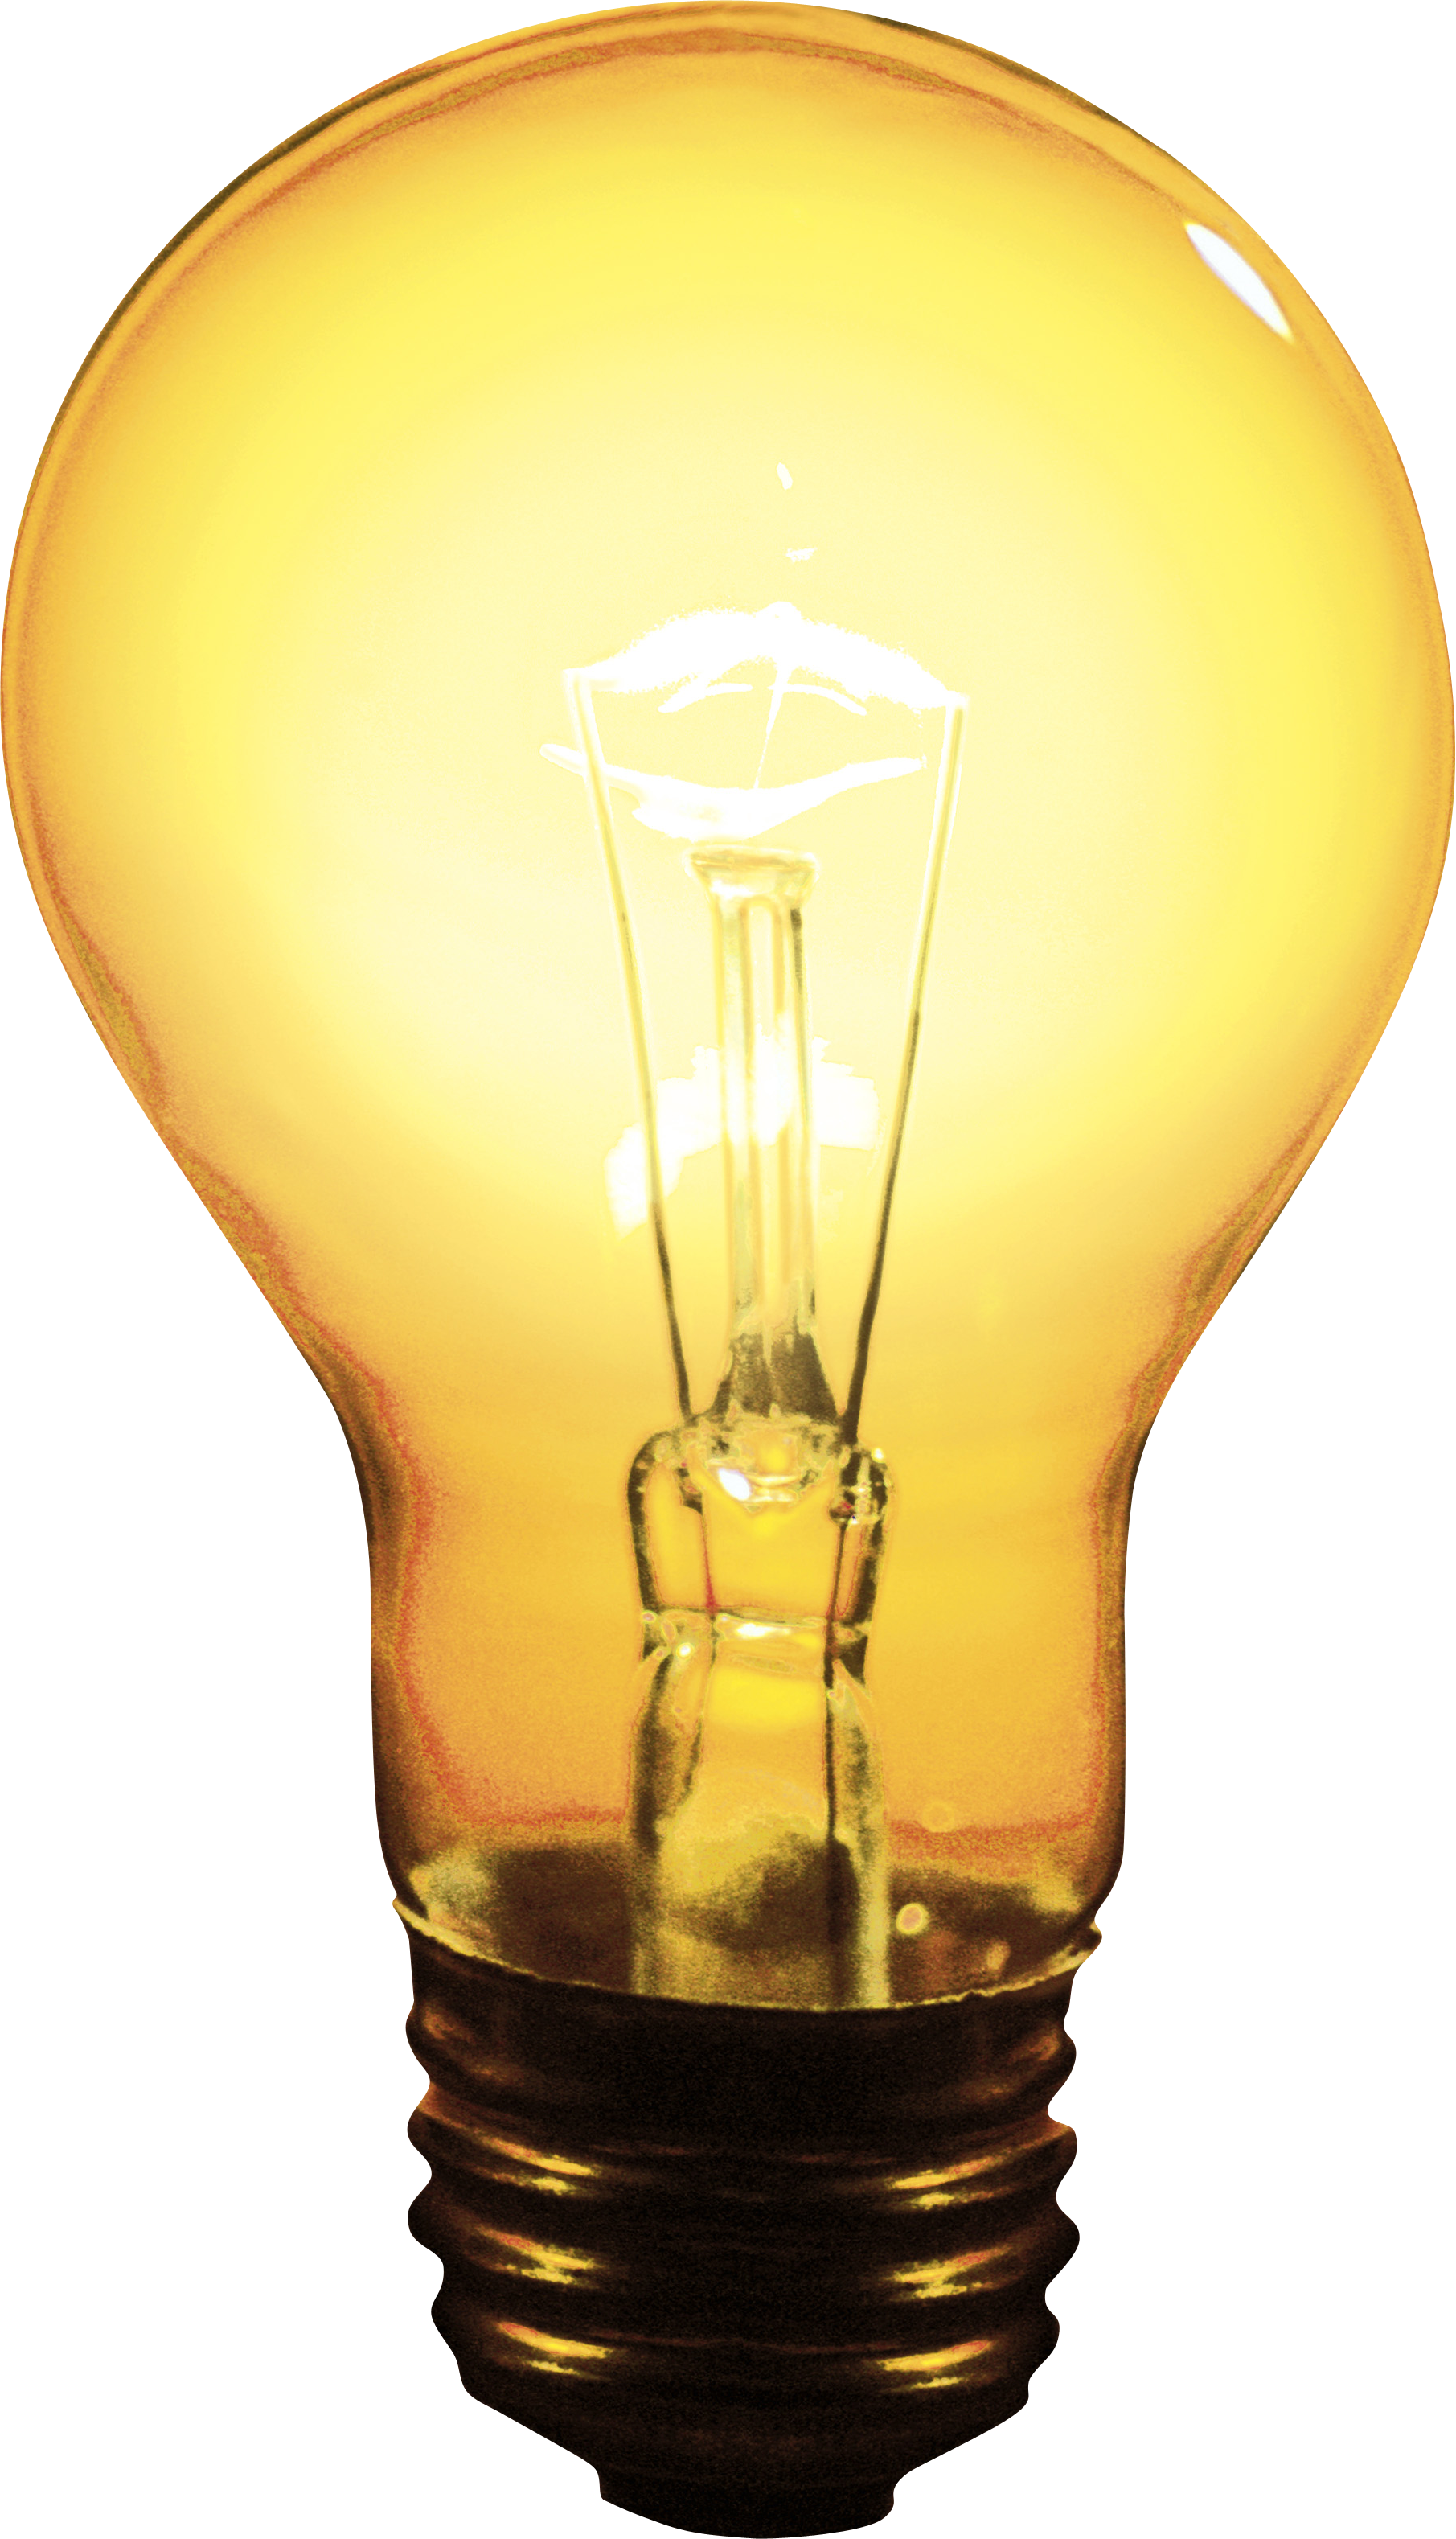 Steampunk clipart lightbulb. Lamp png p balance